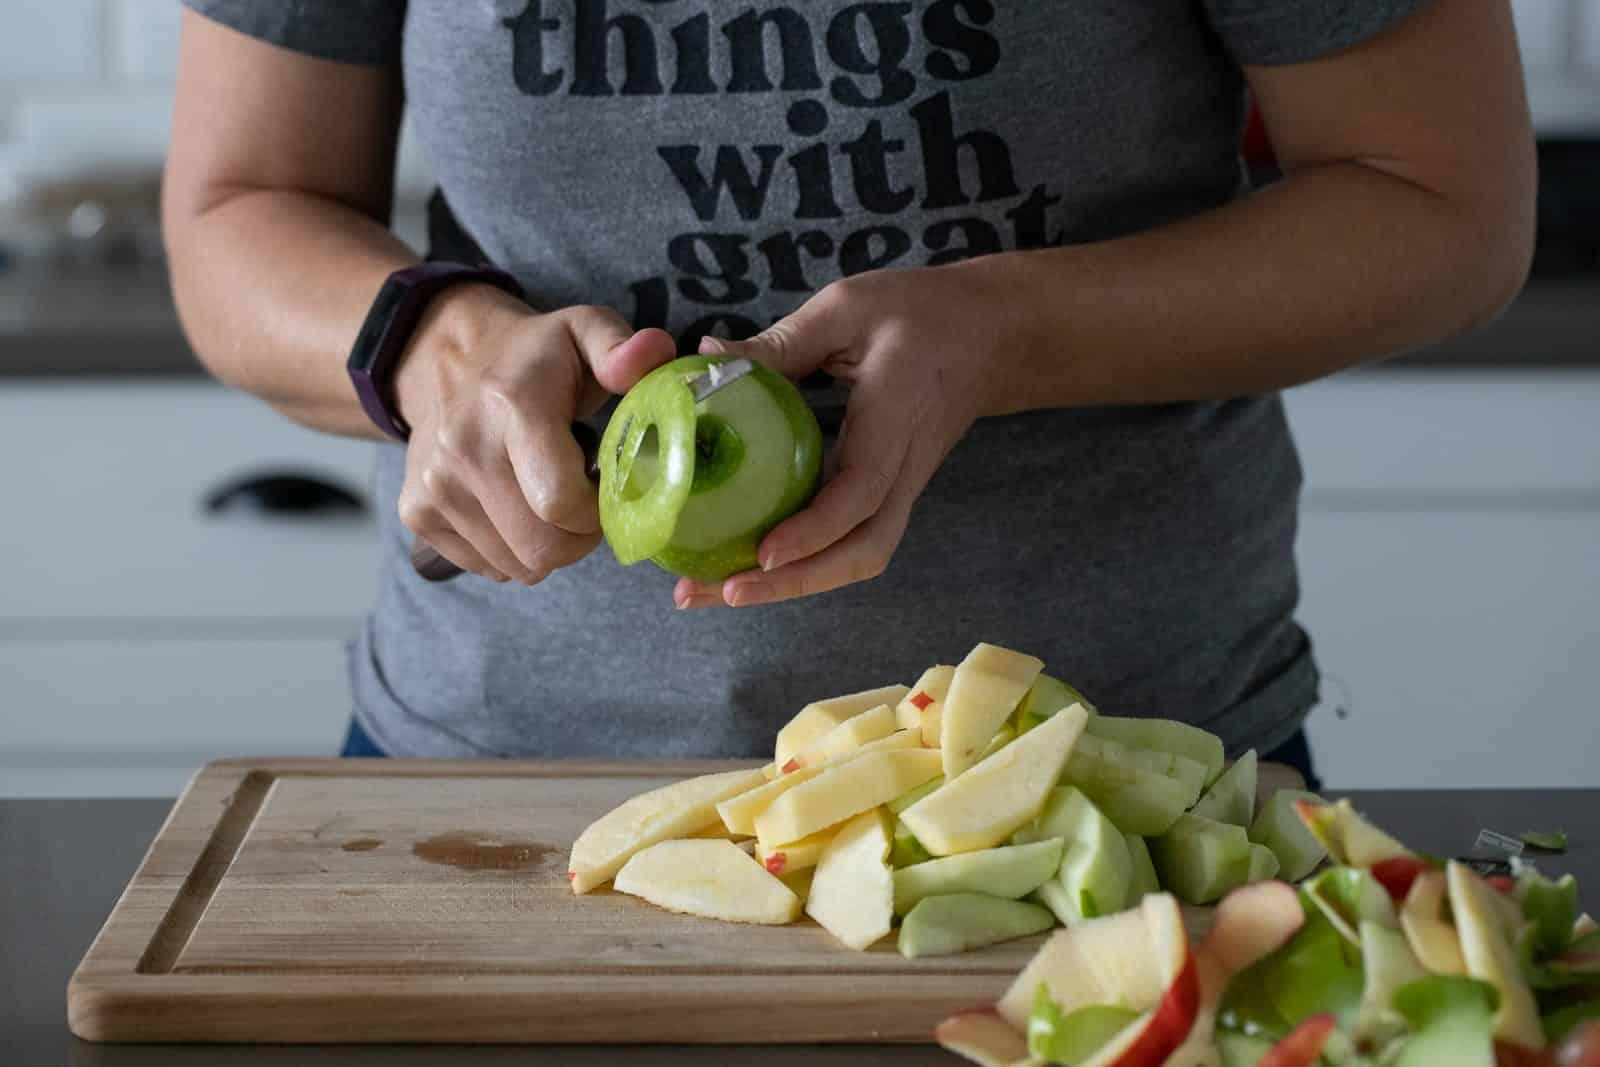 woman peeling apples for apple pie